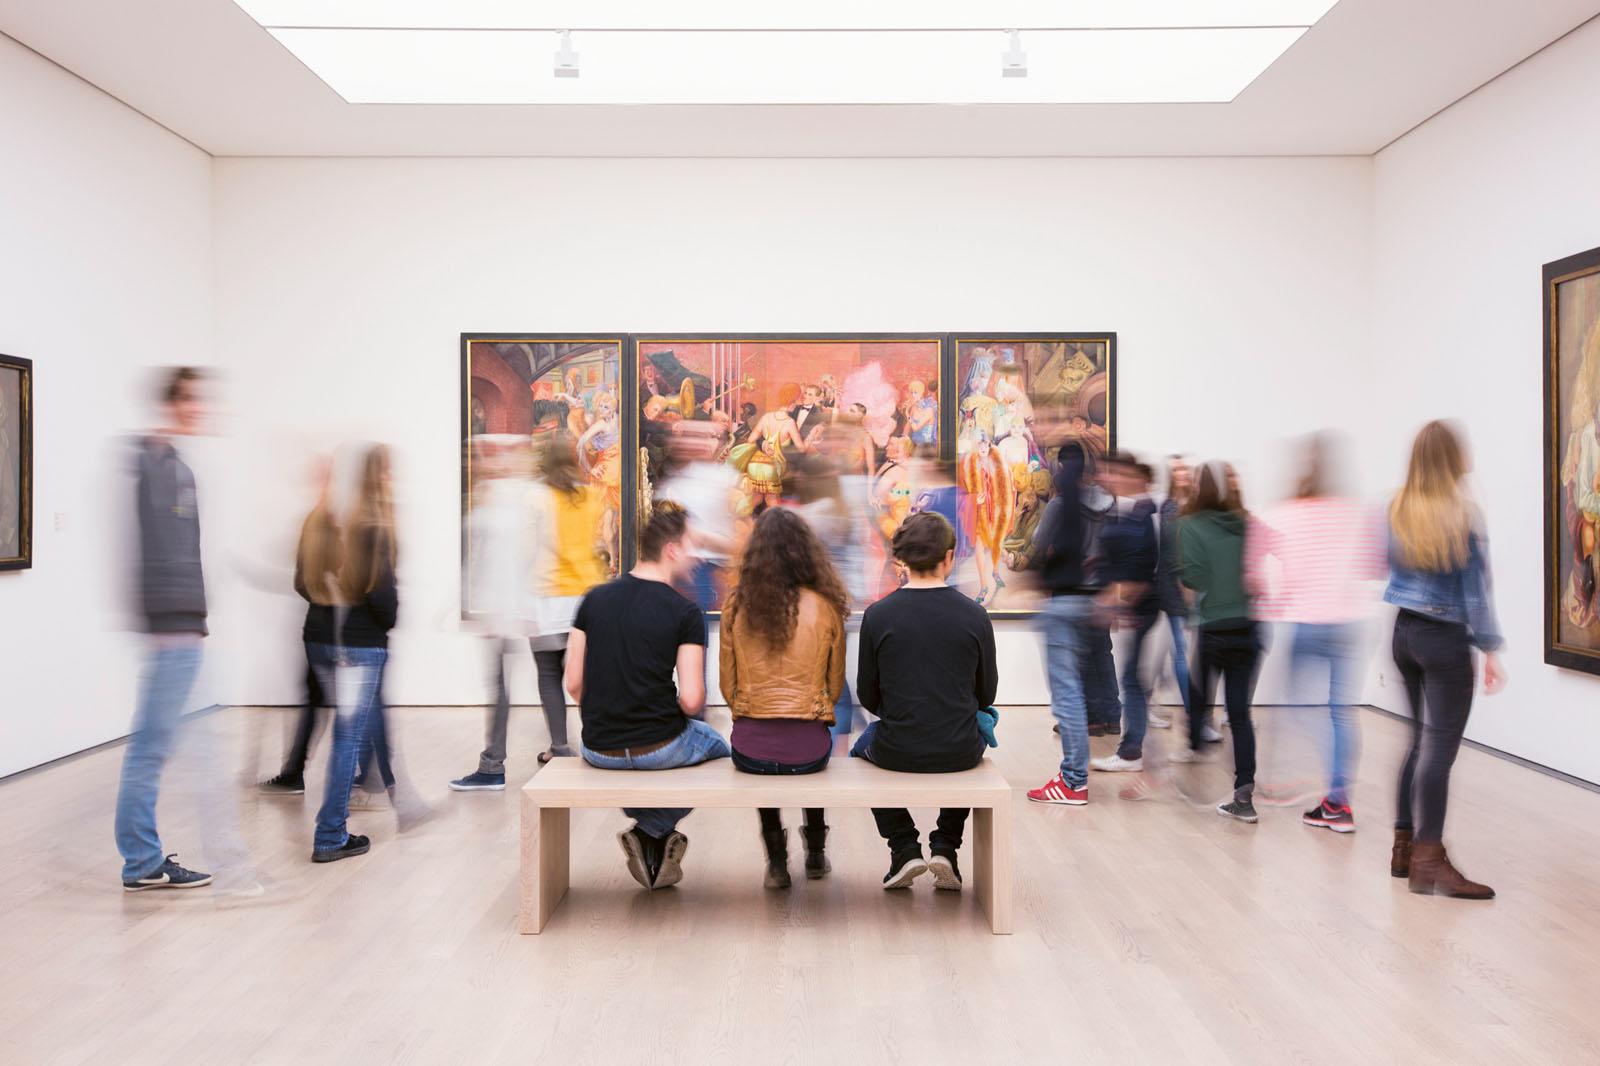 Lange Nacht der Museen Stuttgart - Kunstmuseum Sammlung